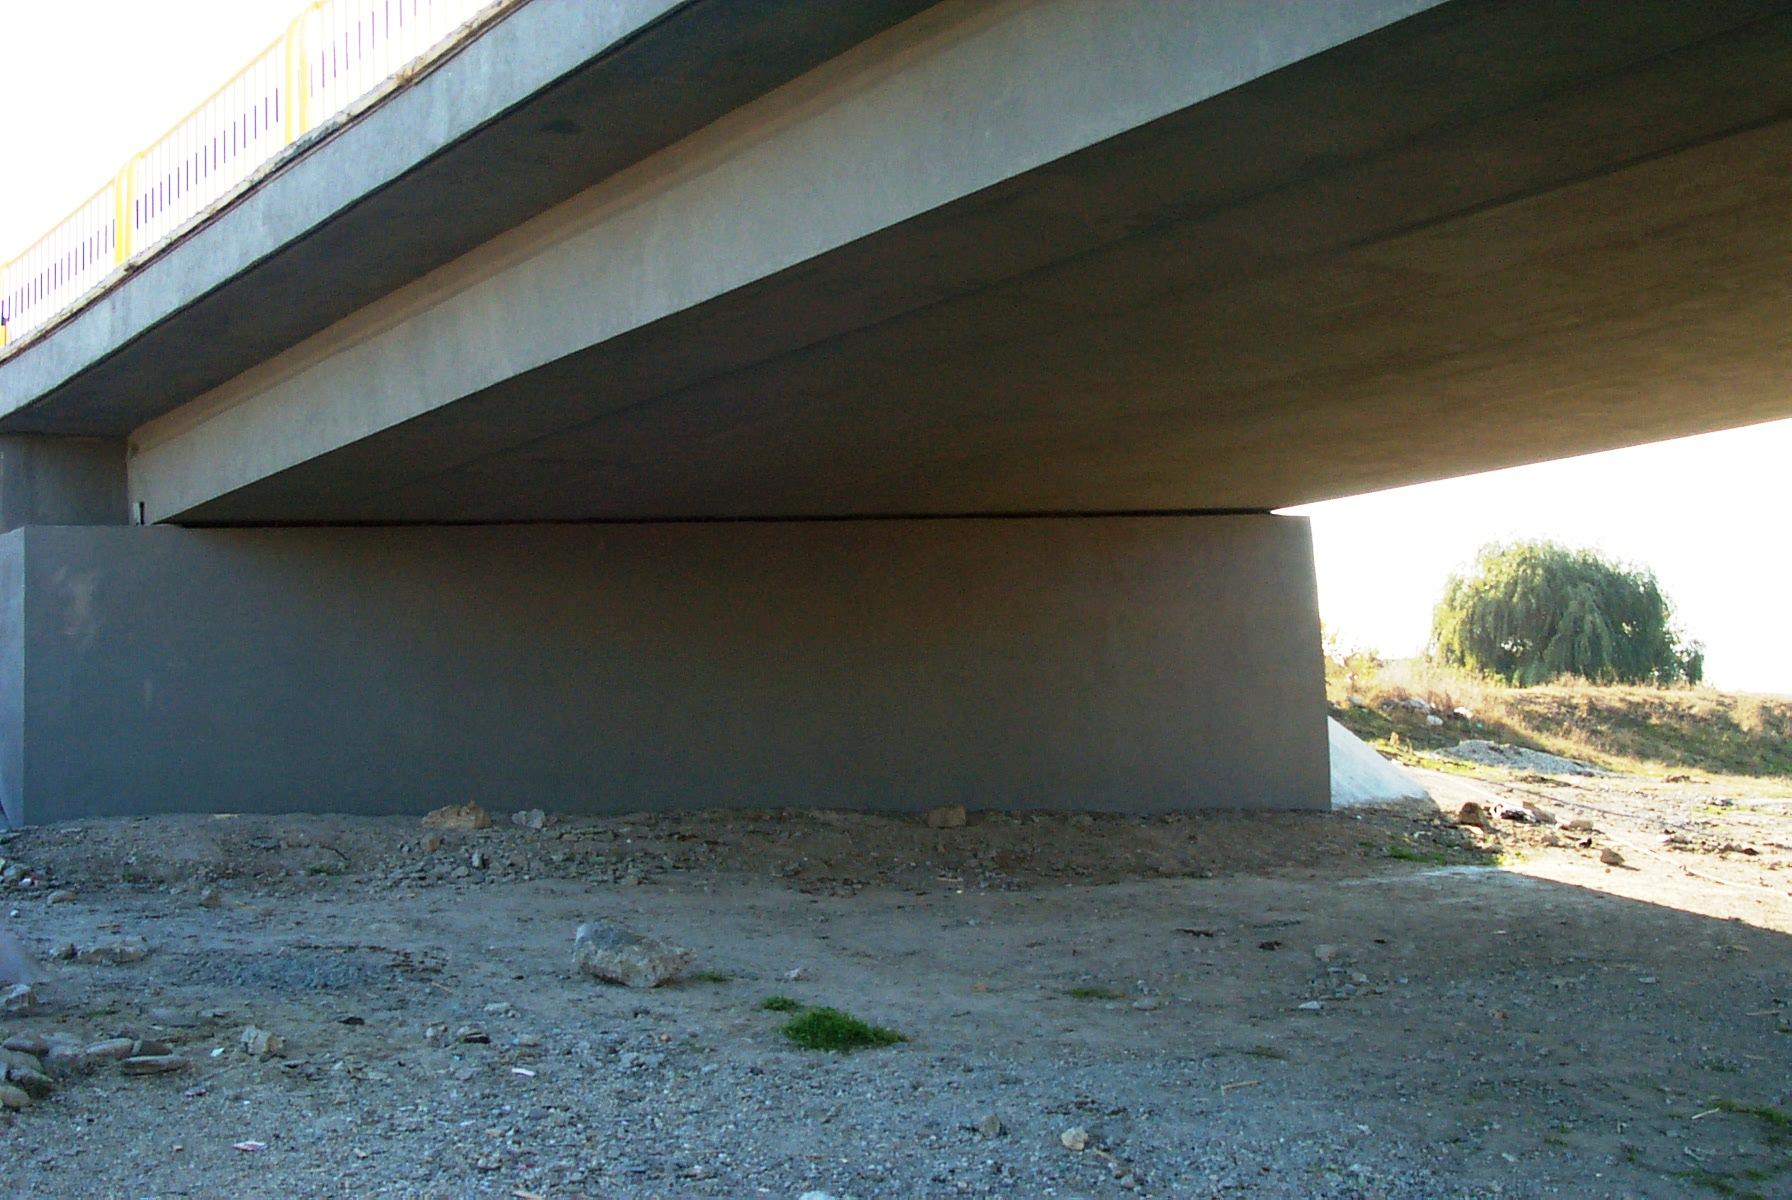 Reparatii pod (DN2), Km. 33 - 028, peste raul Calnistea MAPEI - Poza 23